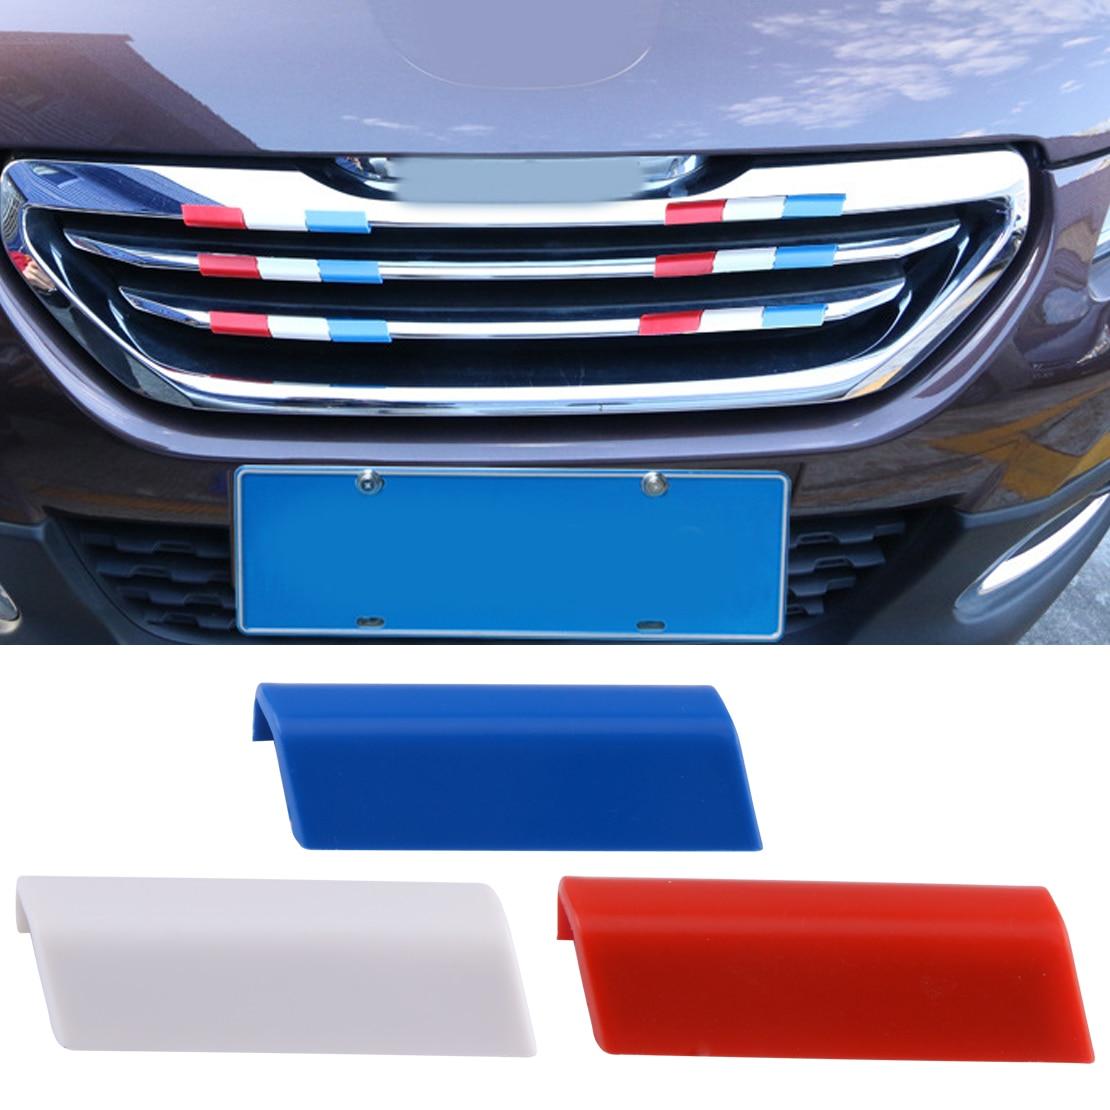 3Pcs Car Front Grille Grill Cover Trim France Flag Color Plastic Fit for Peugeot 301 4008 308 408 grille